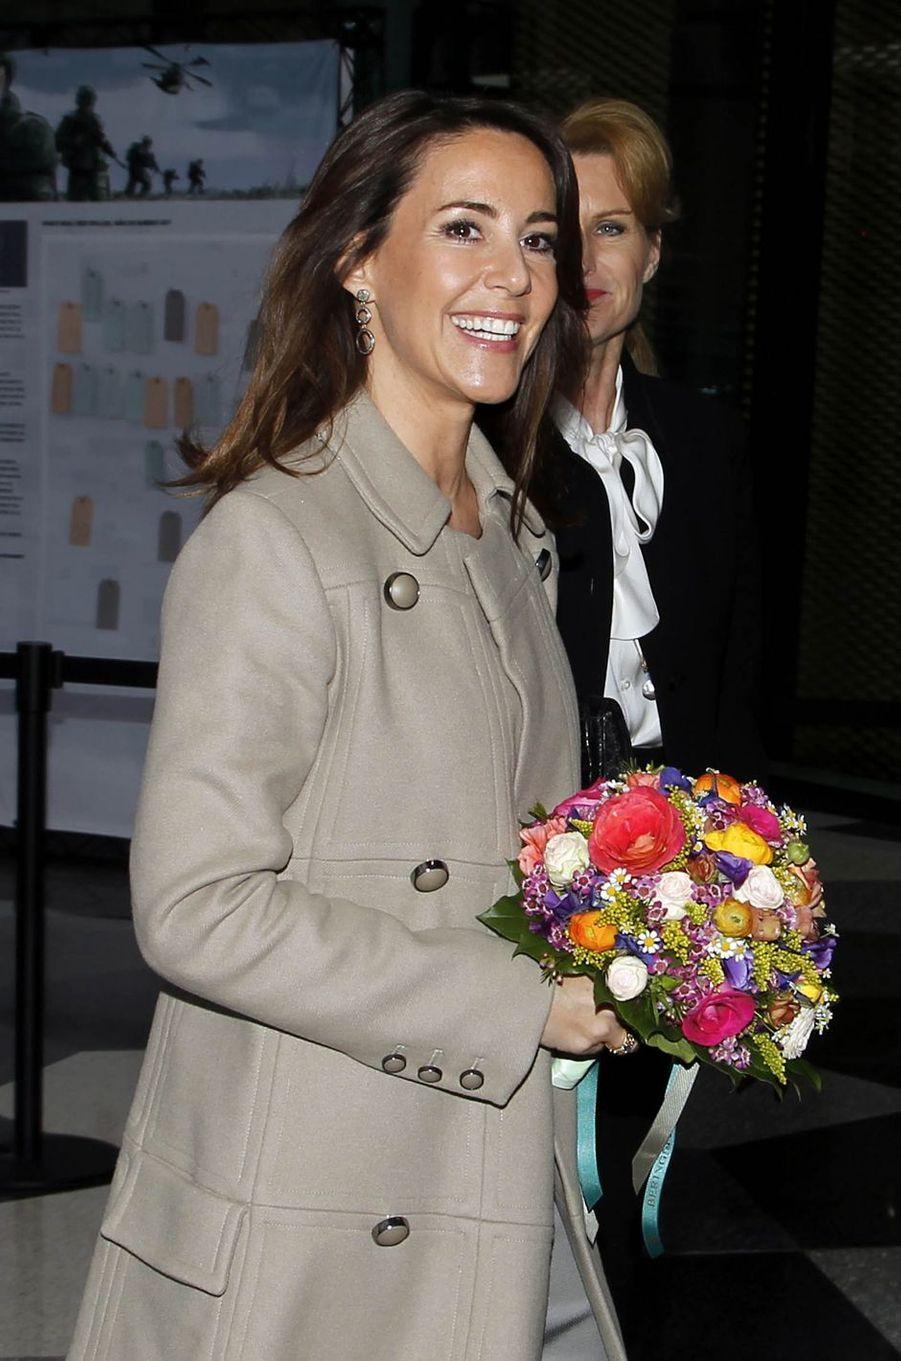 La princesse Marie de Danemark rayonnante à Copenhague, le 20 mars 2019